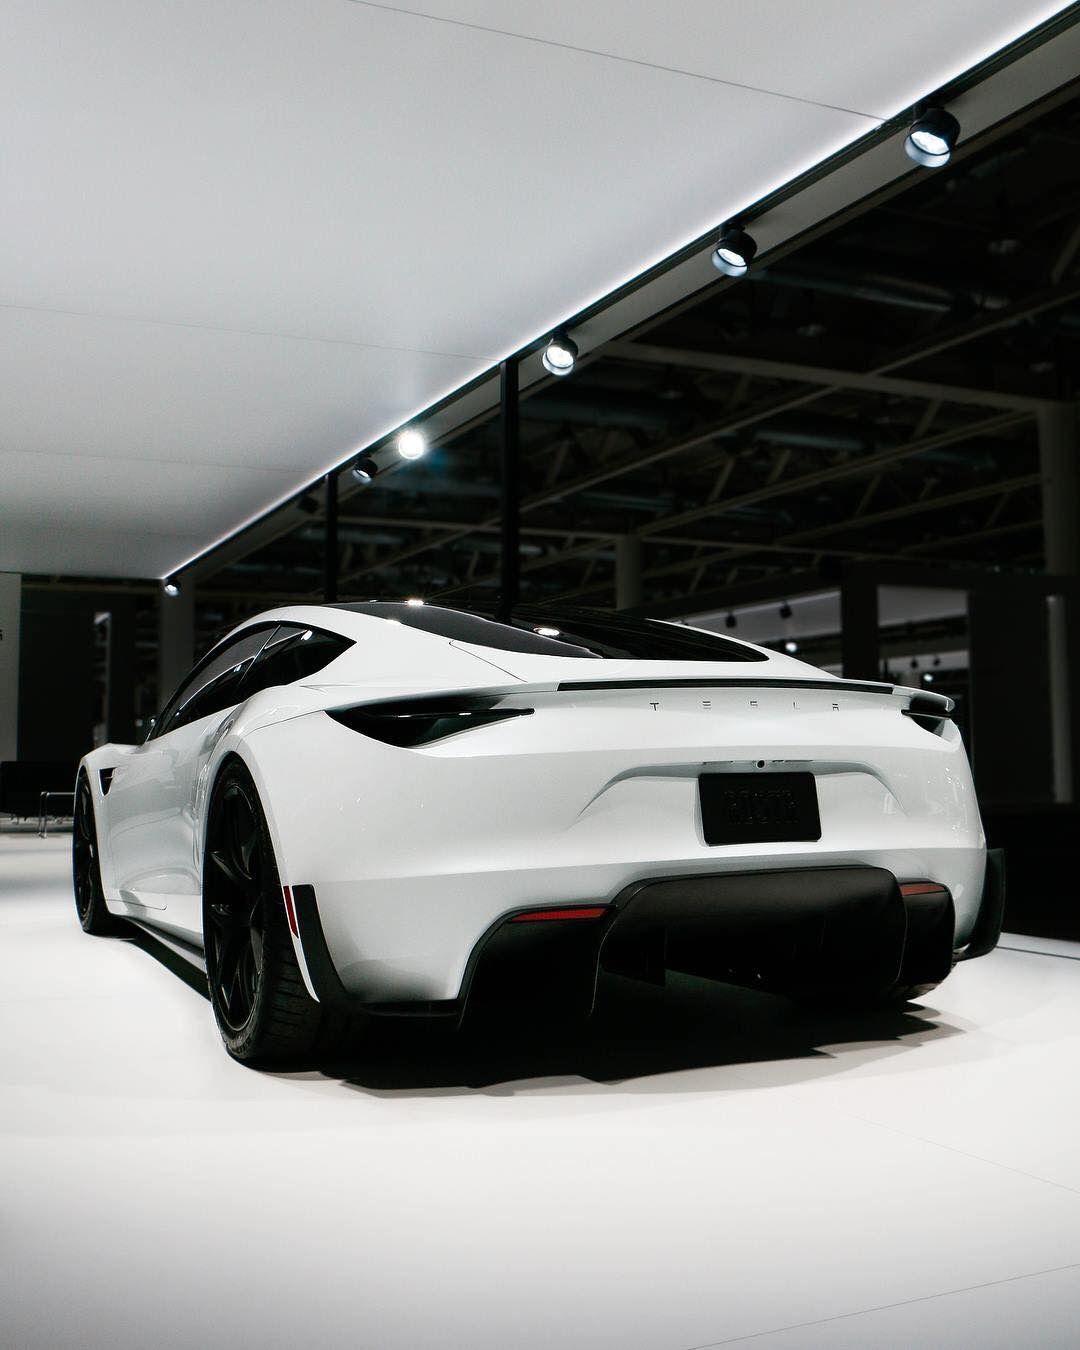 2020 Tesla Roadster Tesla roadster, Fast sports cars